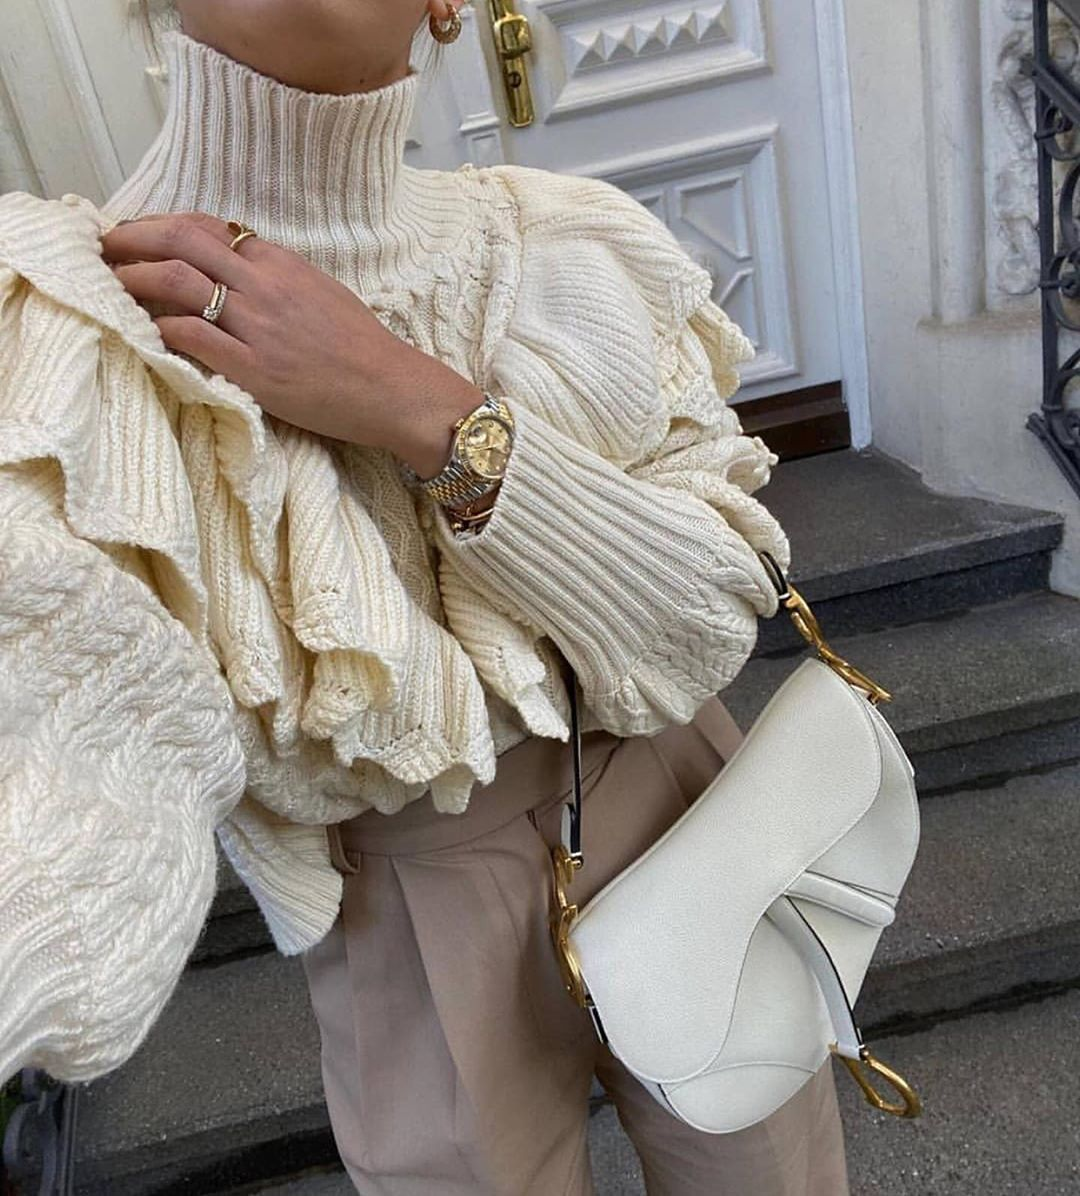 sweater with twists and ruffles de Zara sur fash_adore